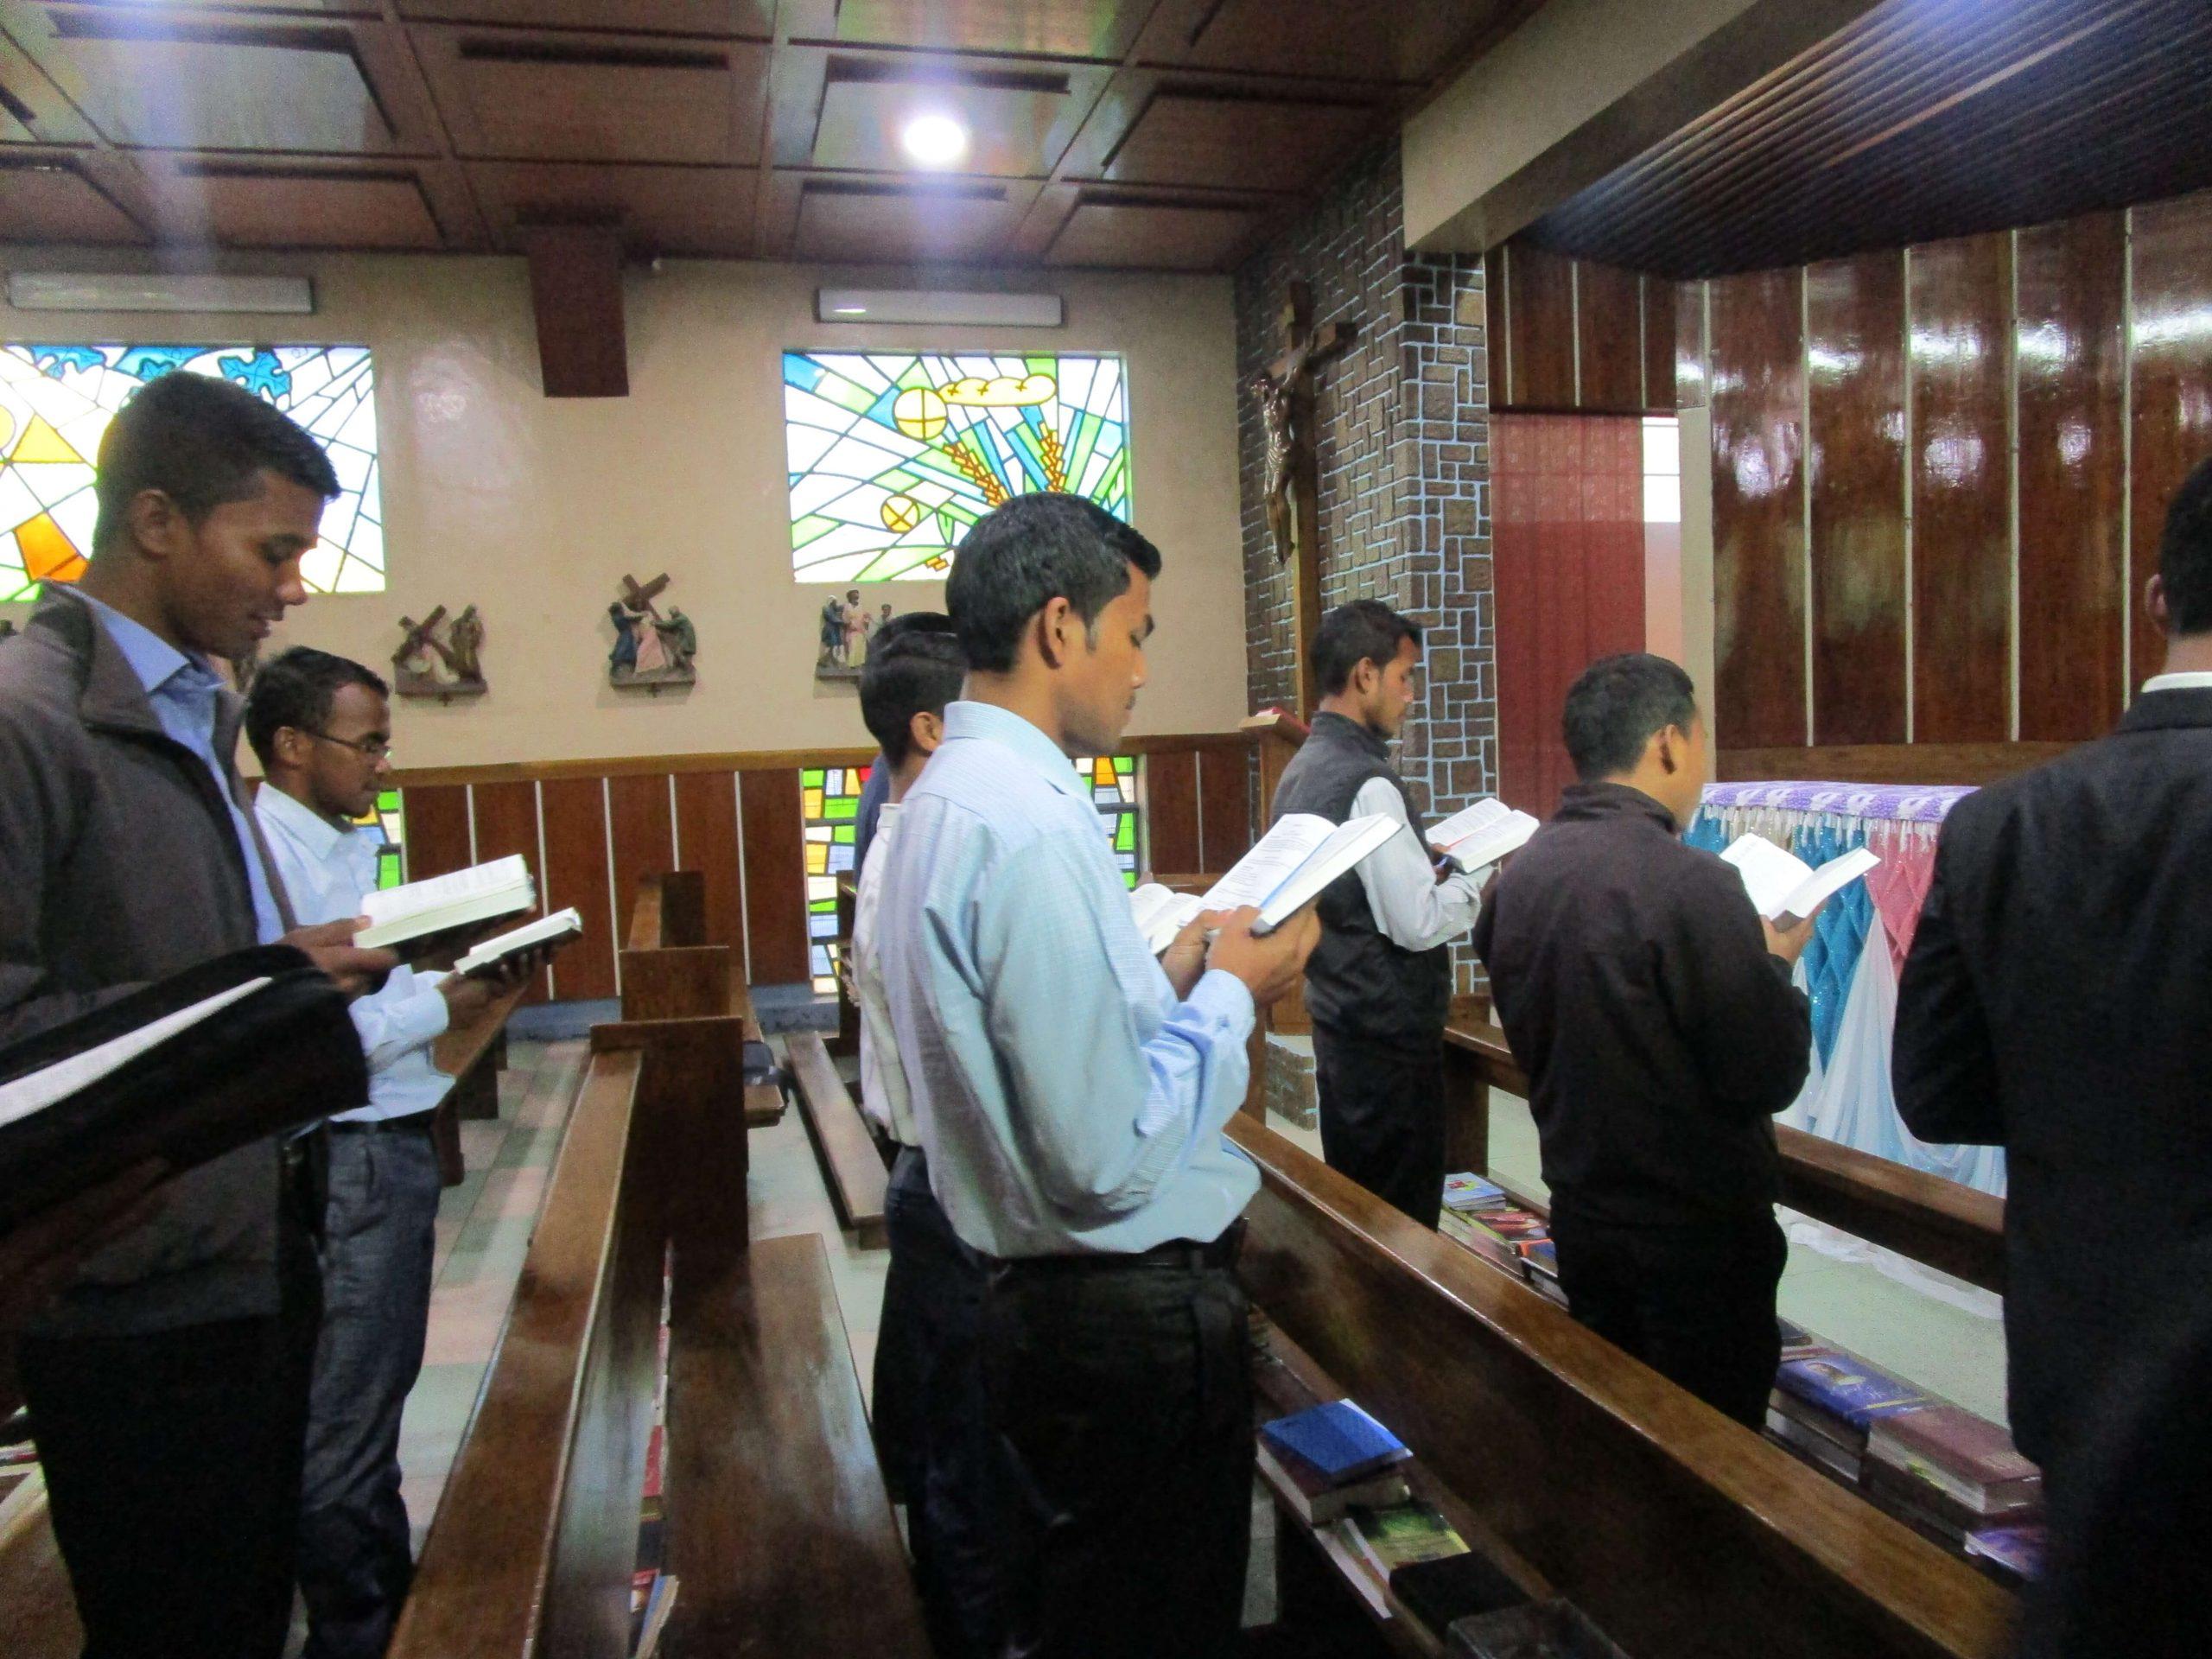 Seminarians from the Diocese of Jowai, India, at morning prayers